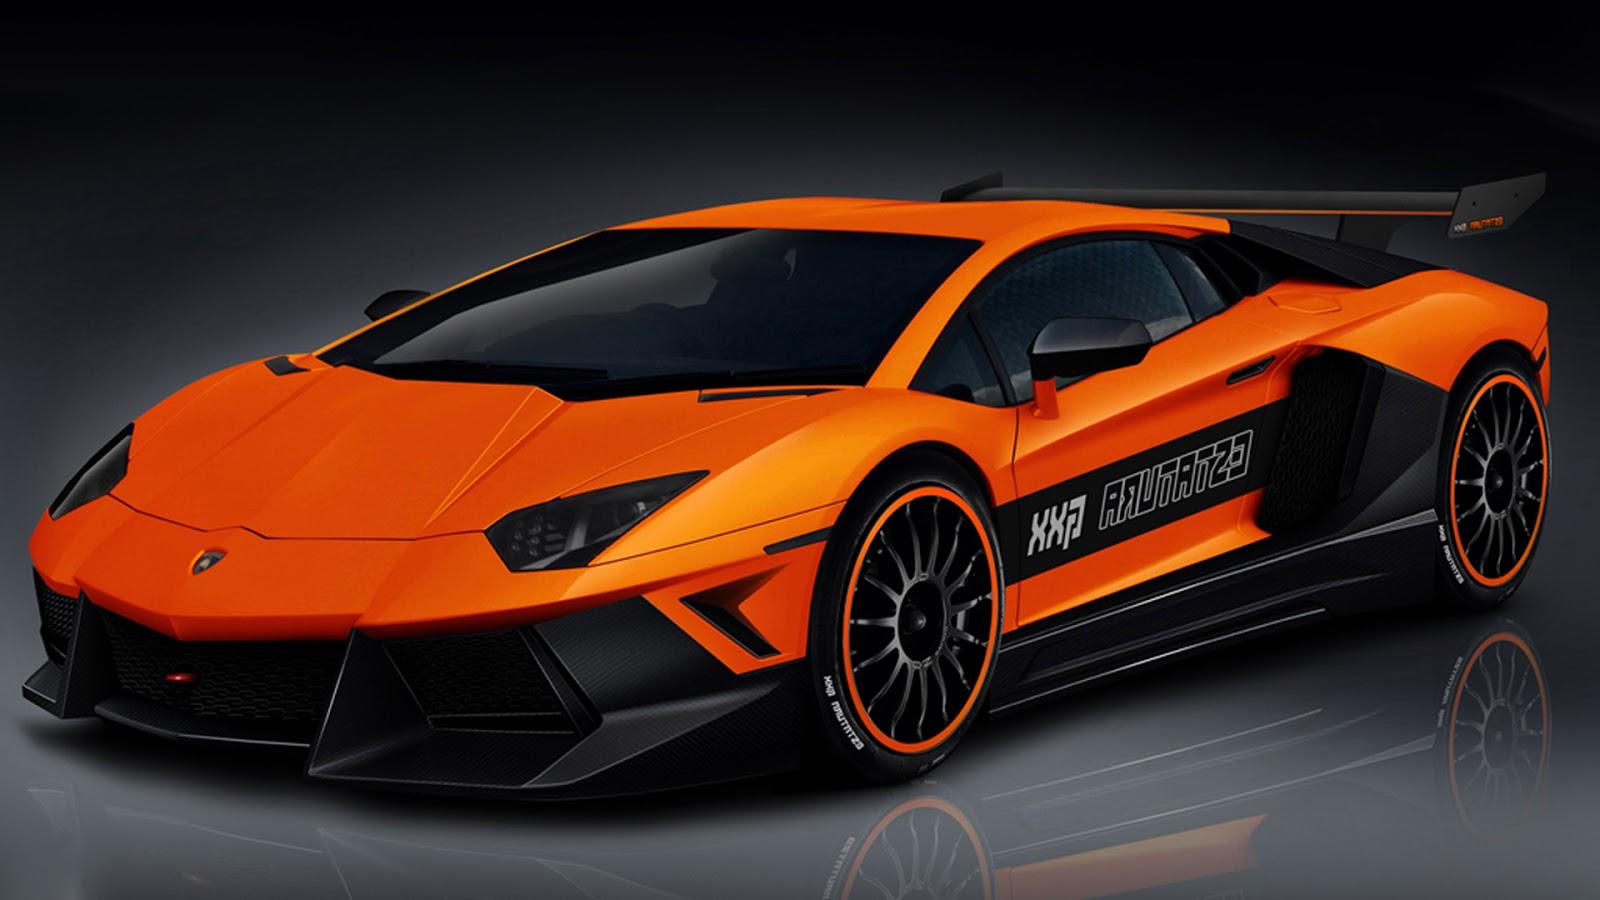 Lamborghini ,lamborghini dallas,lamborghini huracan,lamborghini veneno,lamborghini aventador,lamborghini gallardo,lamborghini aventador price,lamborghini murcielago,lamborghini for sale,lamborghini prices,lamborghini mercy